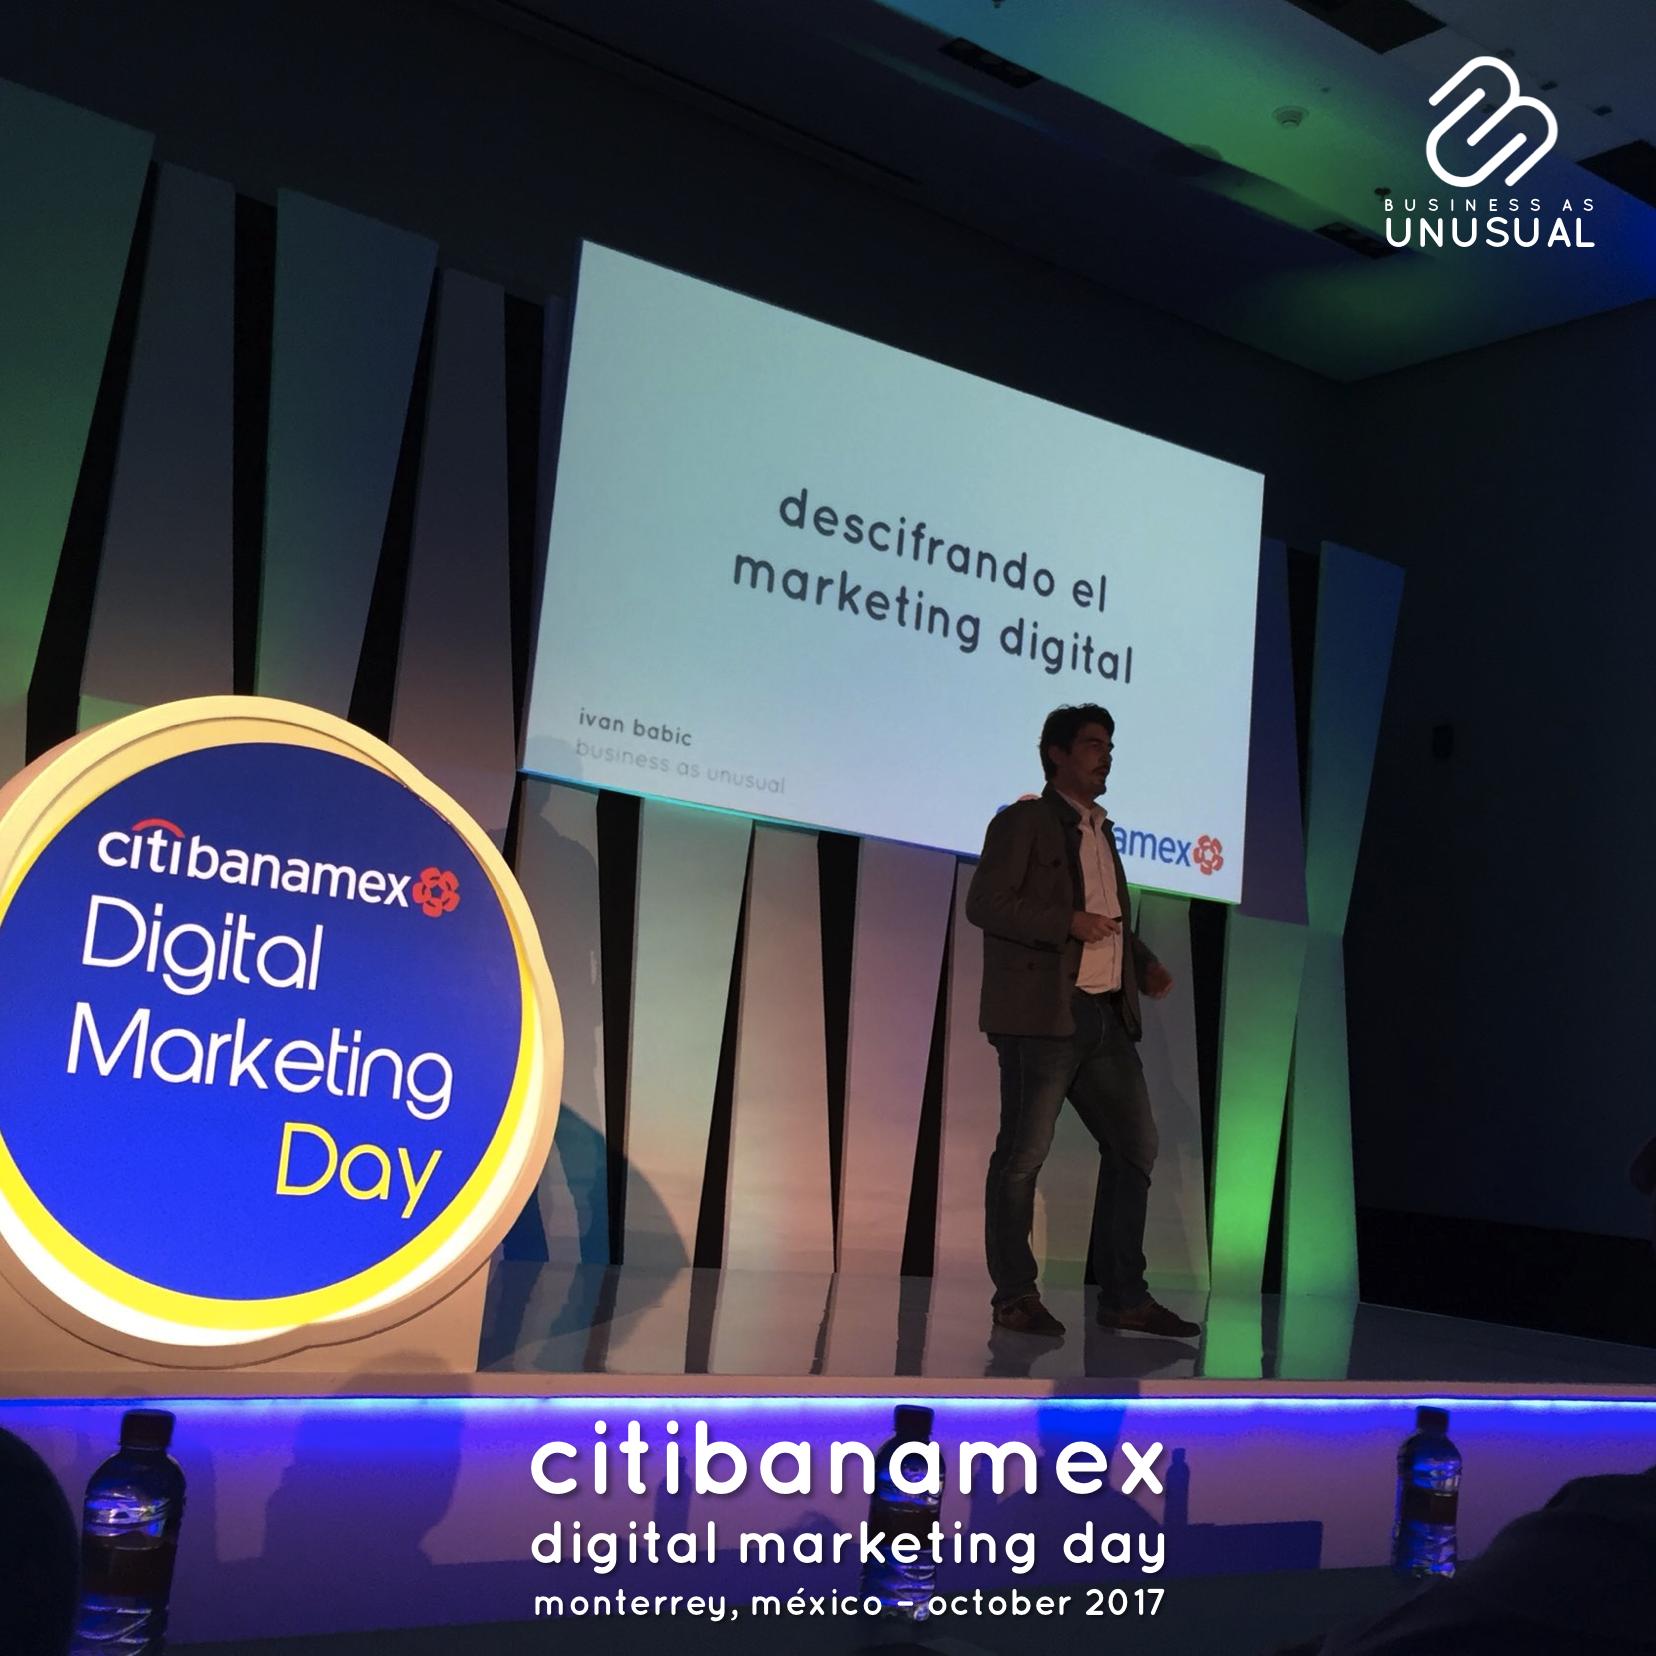 Citibanamex - Digital Marketing Day - Monterrey